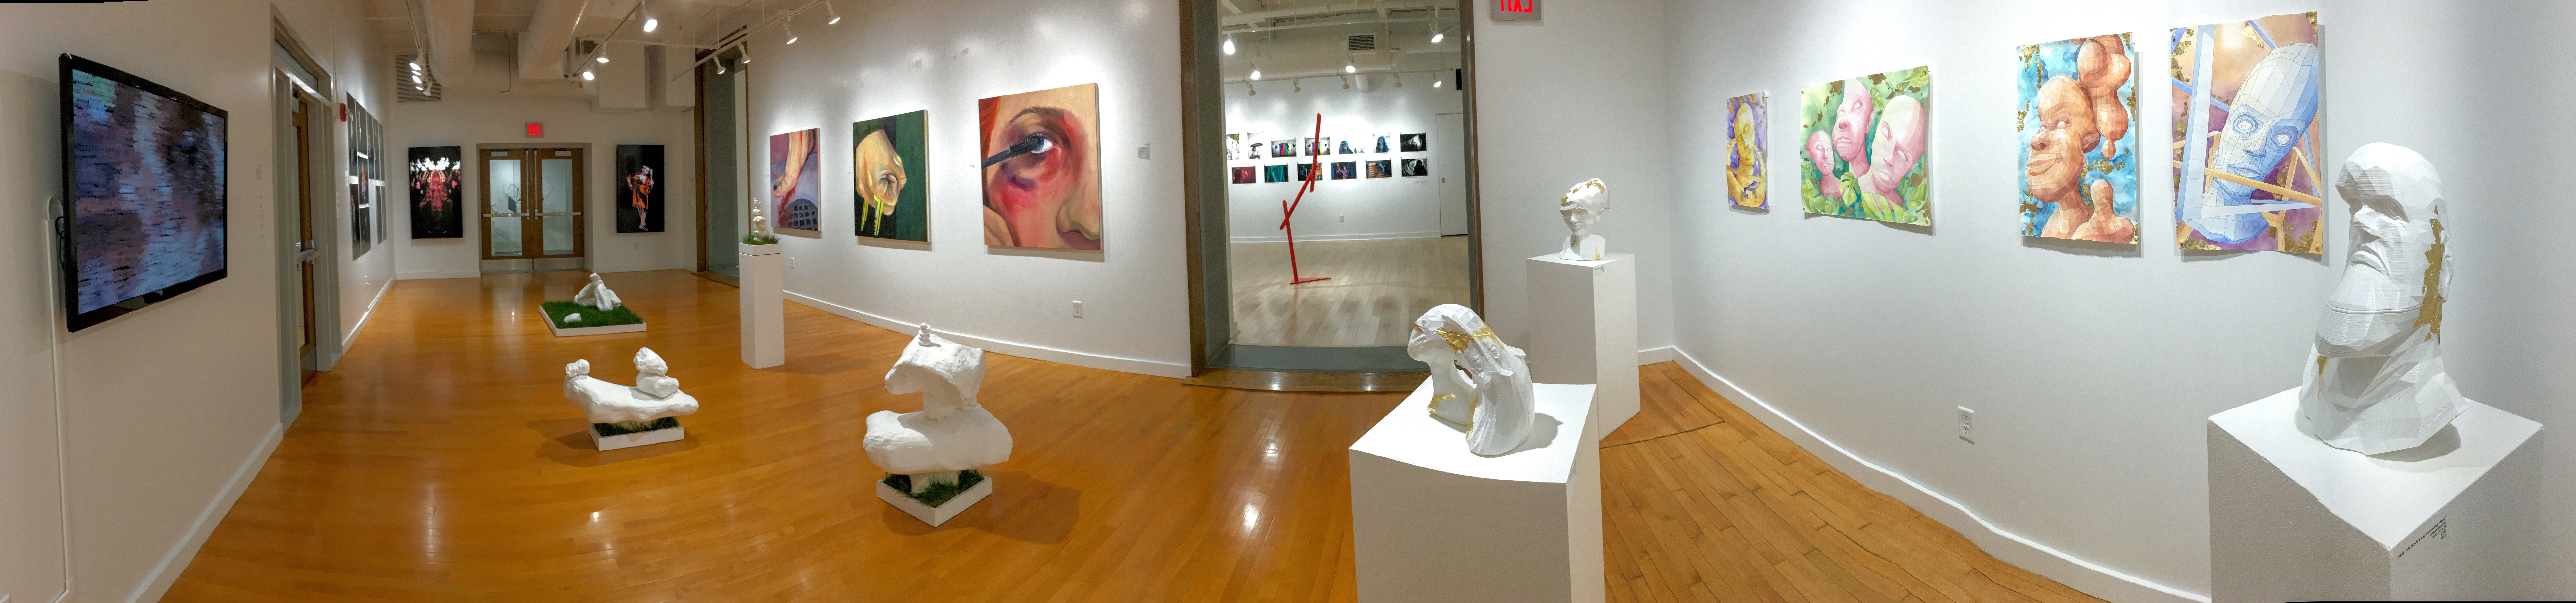 First Annual Senior Show Gallery Talks!